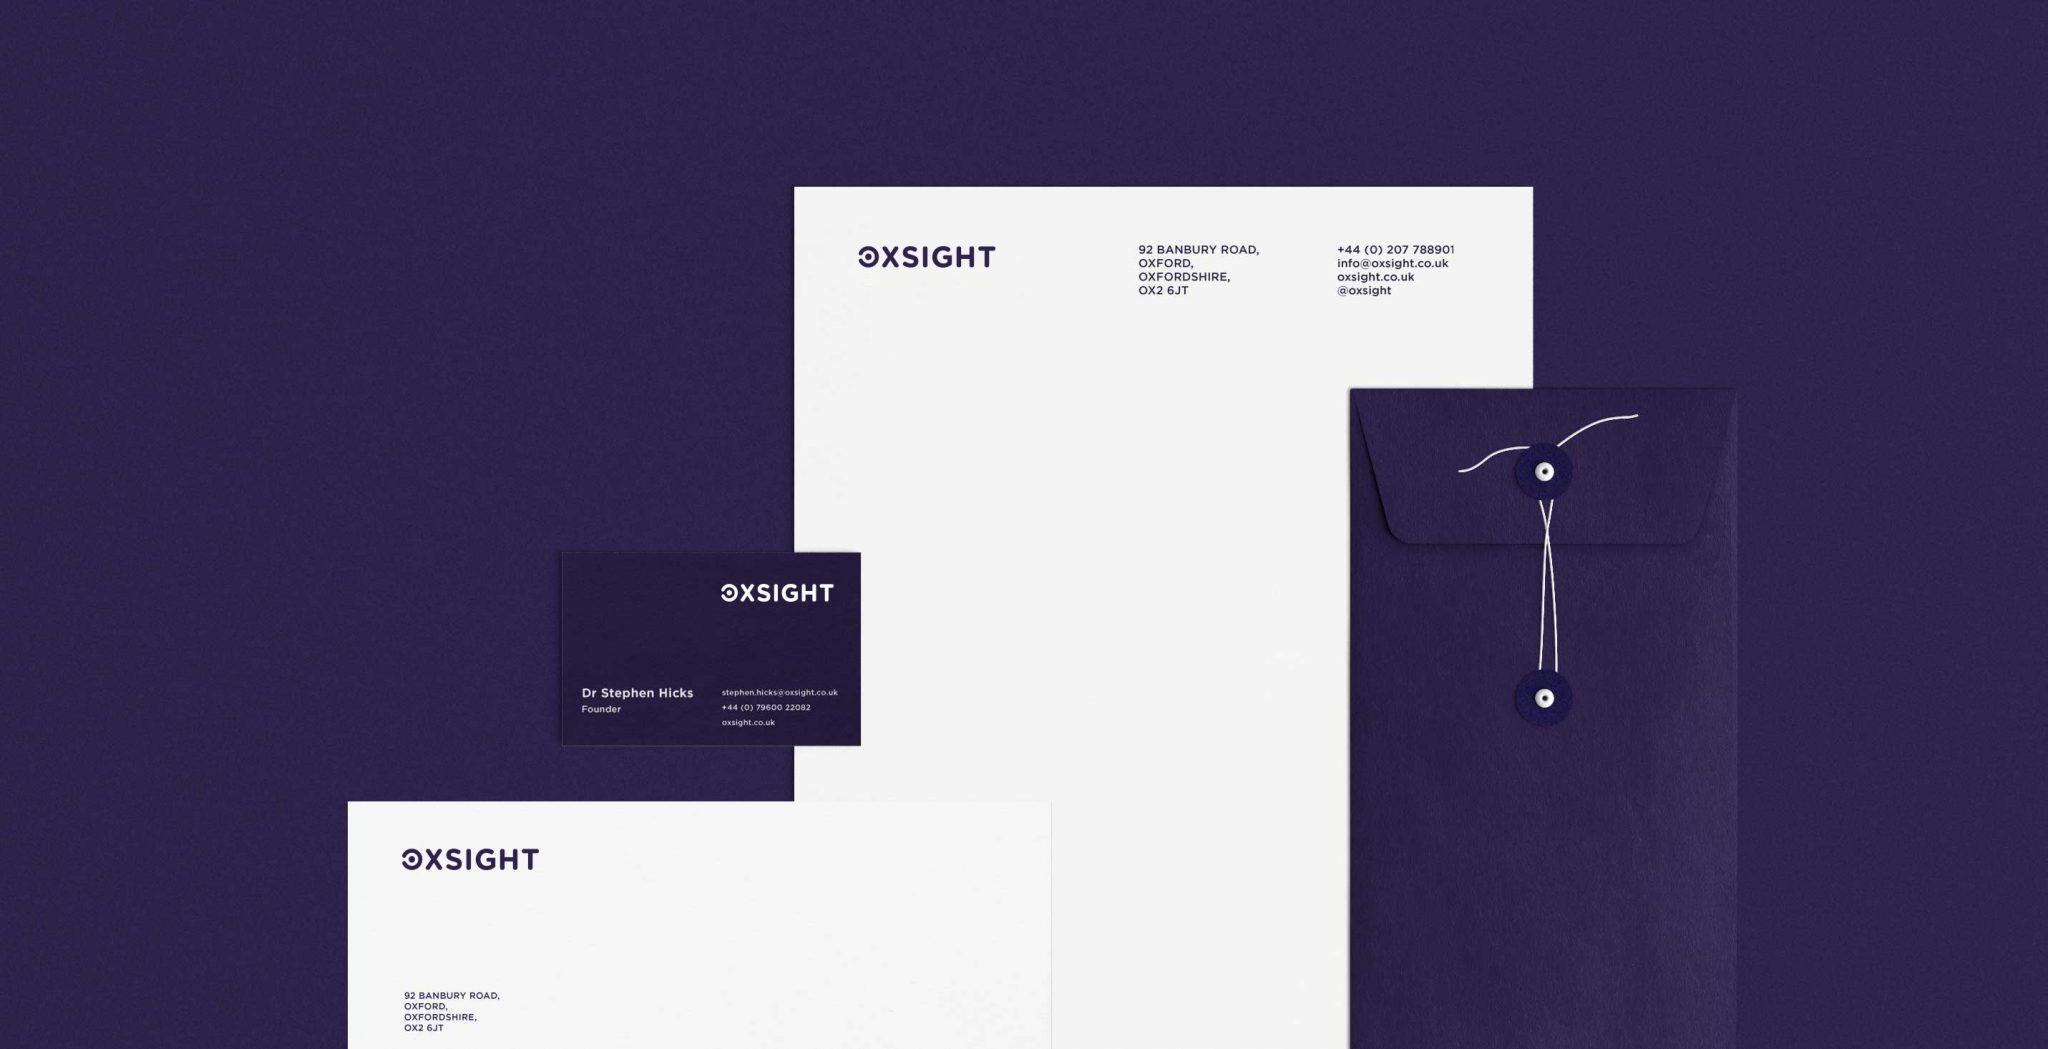 OXsight-stationery-2